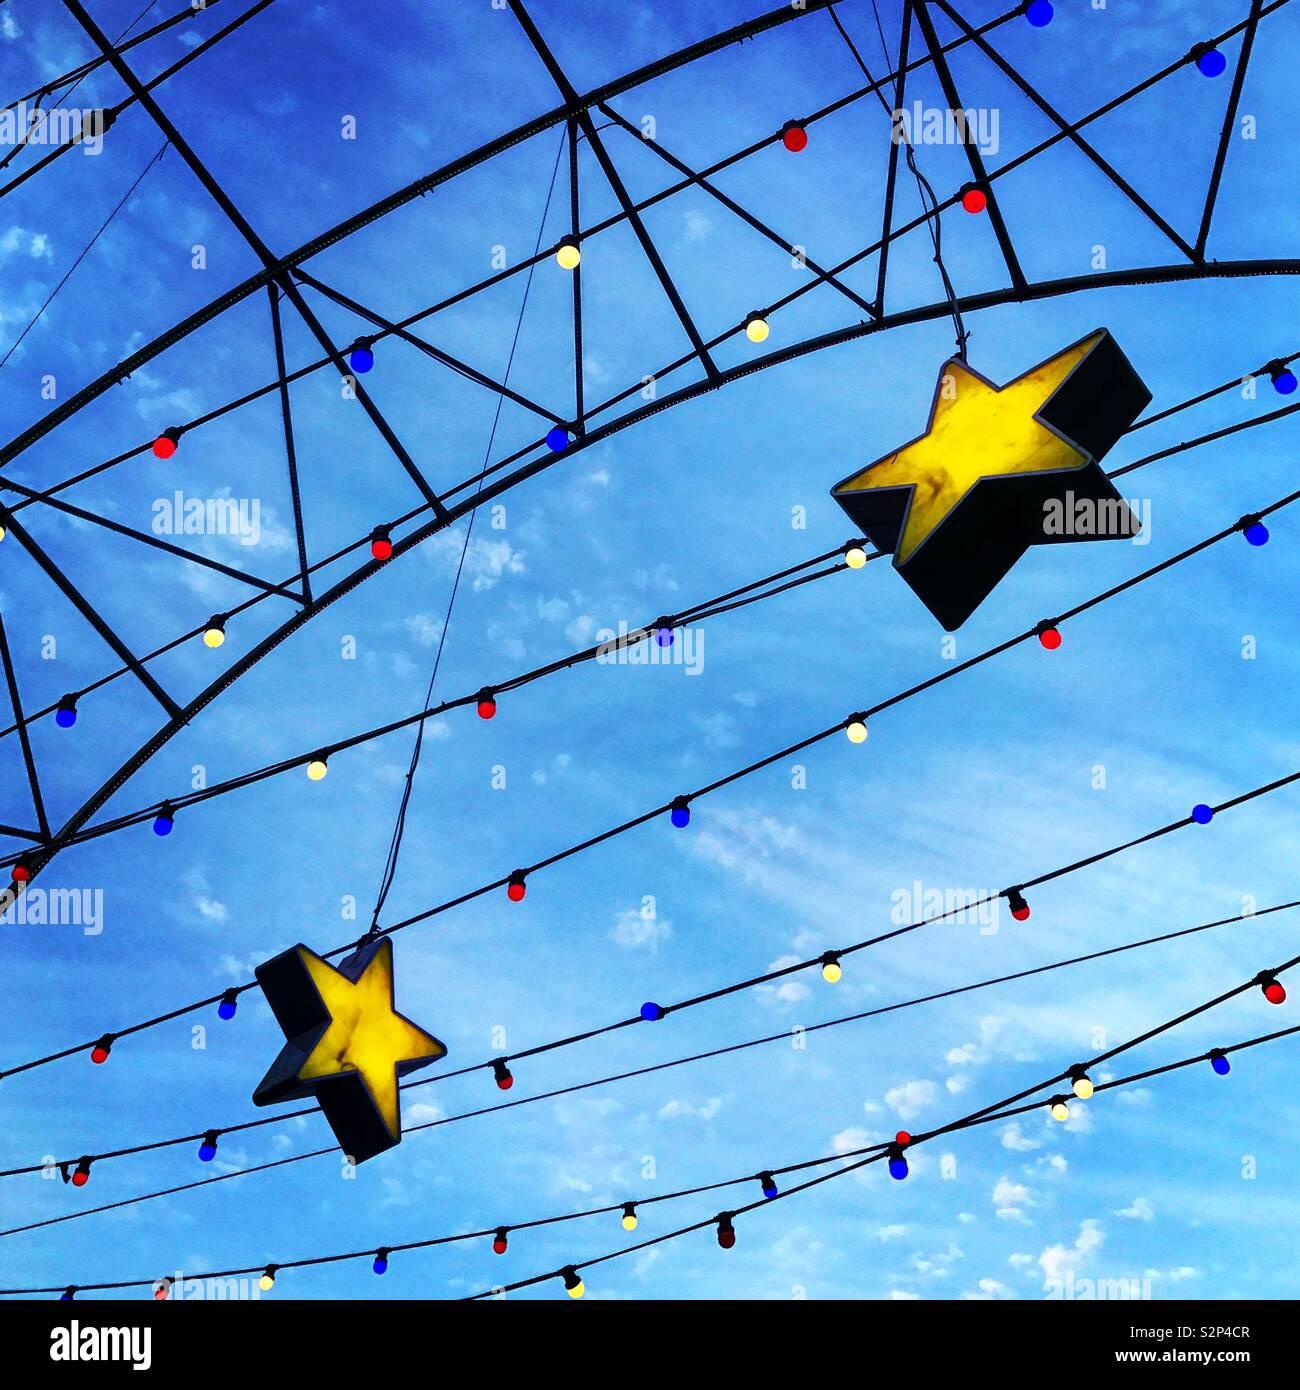 Stars - Stock Image